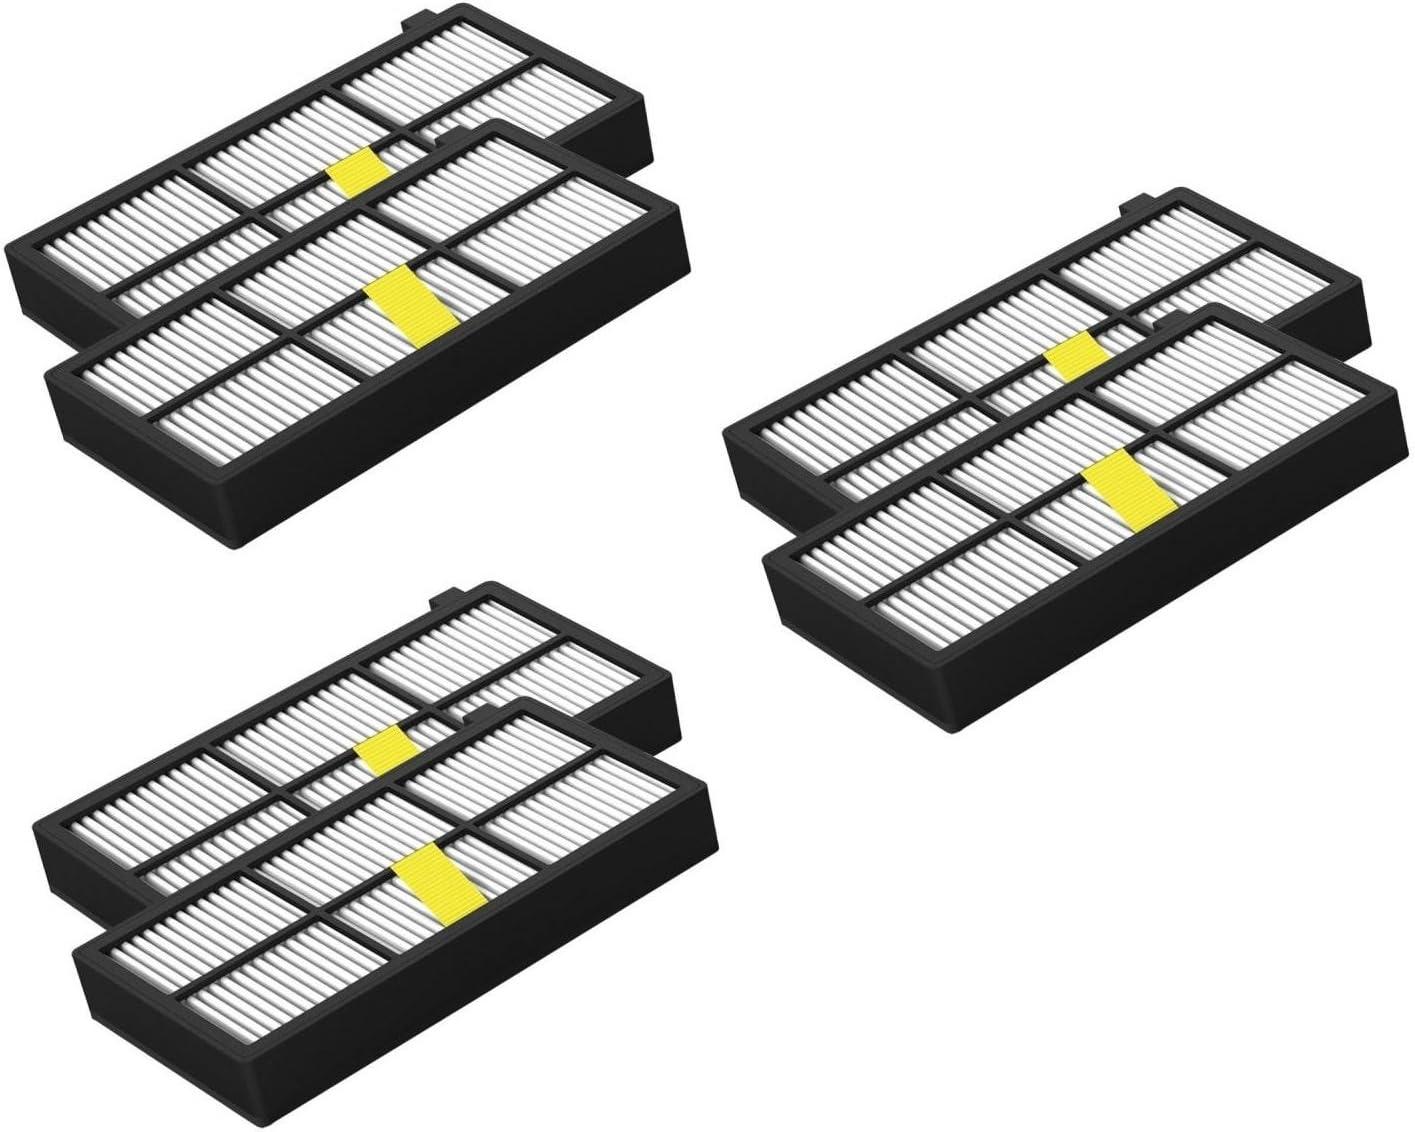 6 pack filtro HEPA para Aspiradora Roomba 860, 866, 870, 871, 880, 886, 890, 900, 960, 966, 970, 980, 990: Amazon.es: Hogar